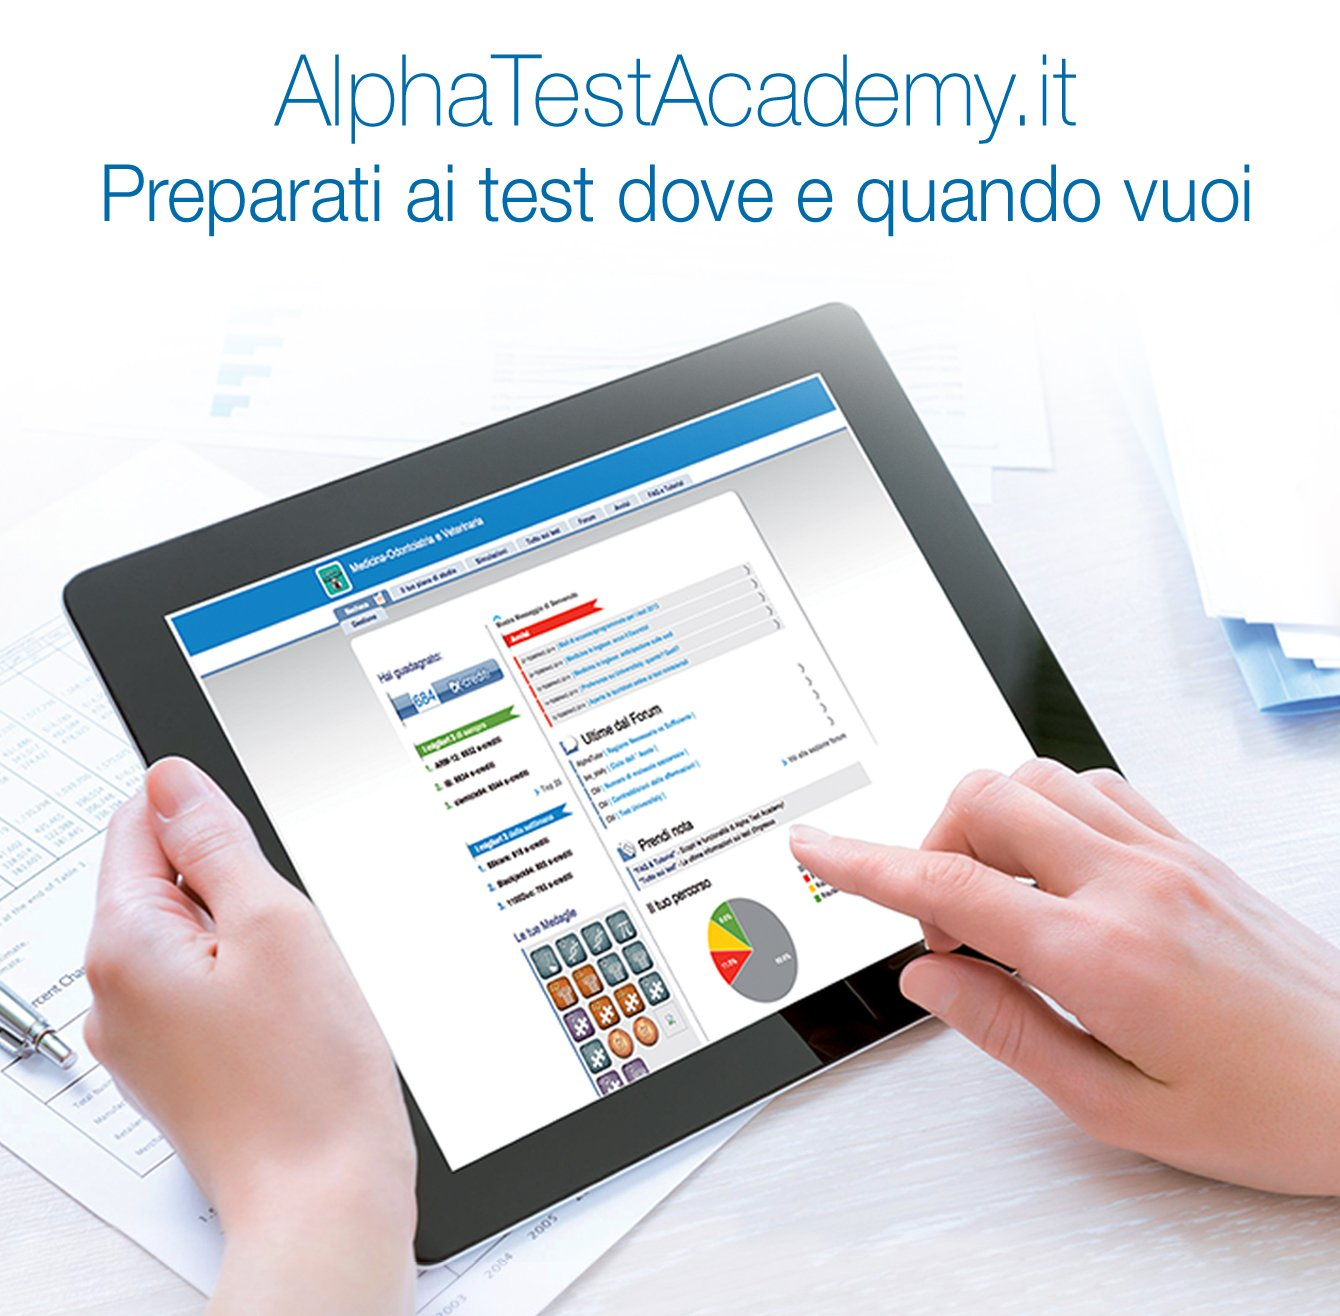 AlphaTestAcademy.it